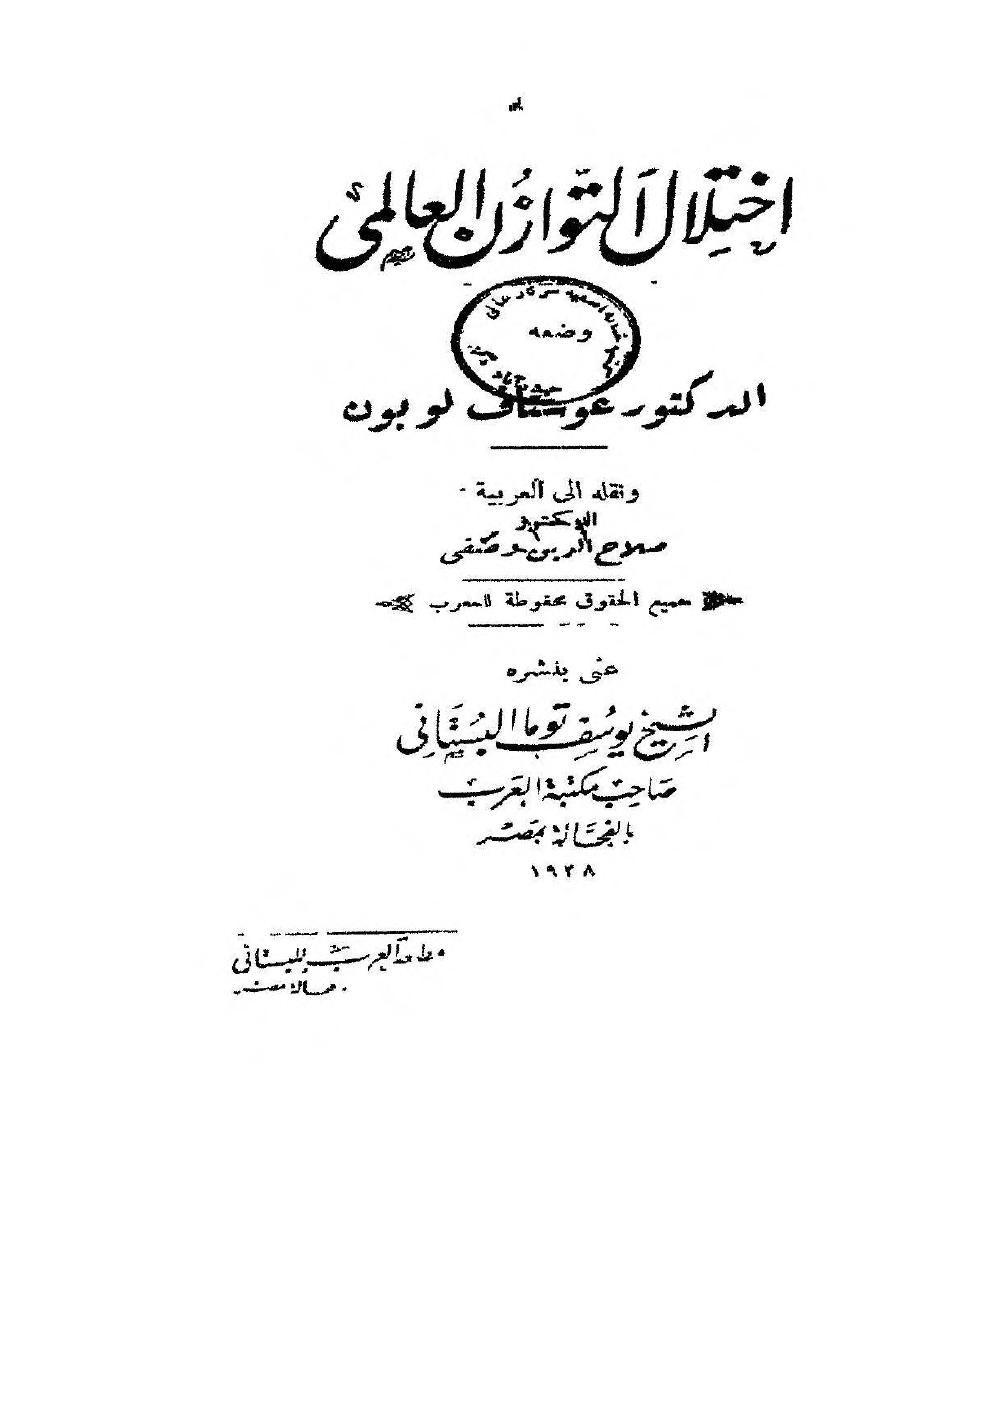 اختلال التوازن العالمي د غوستاف لوبون Free Books1 Free Download Borrow And Streaming Internet Archive Pdf Books Books Texts